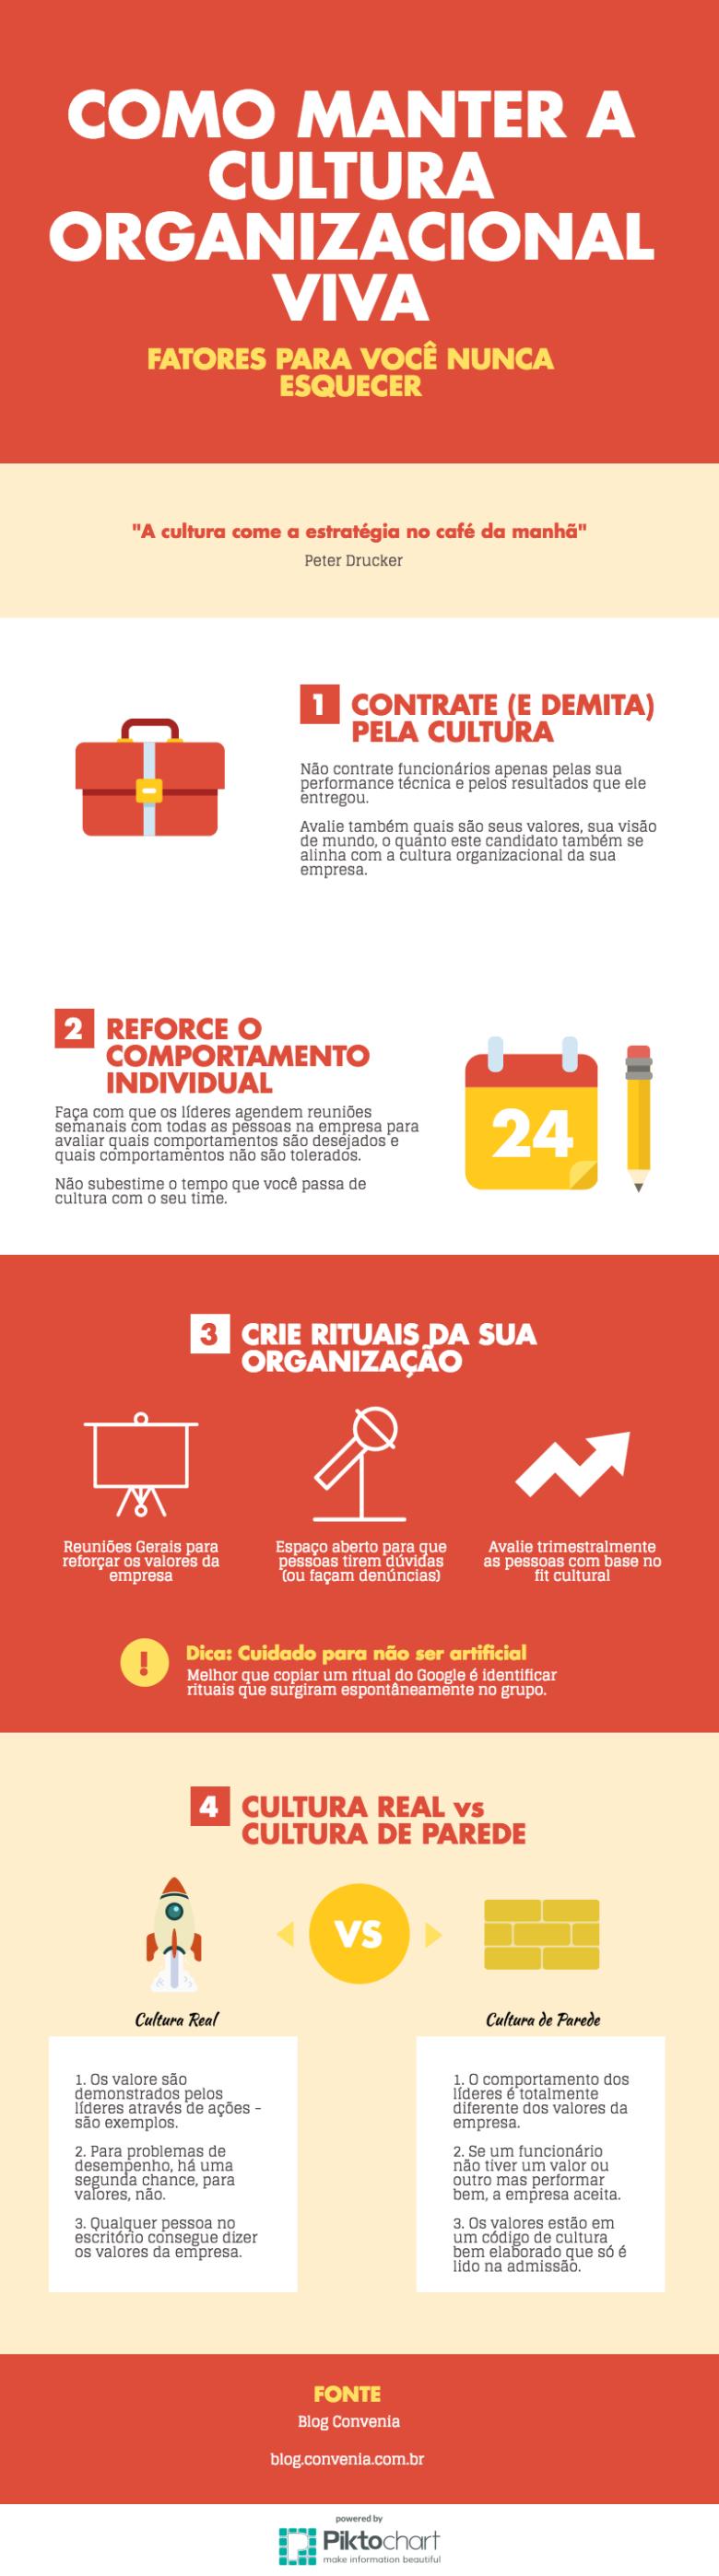 inforgrafico-cultura-organizacional